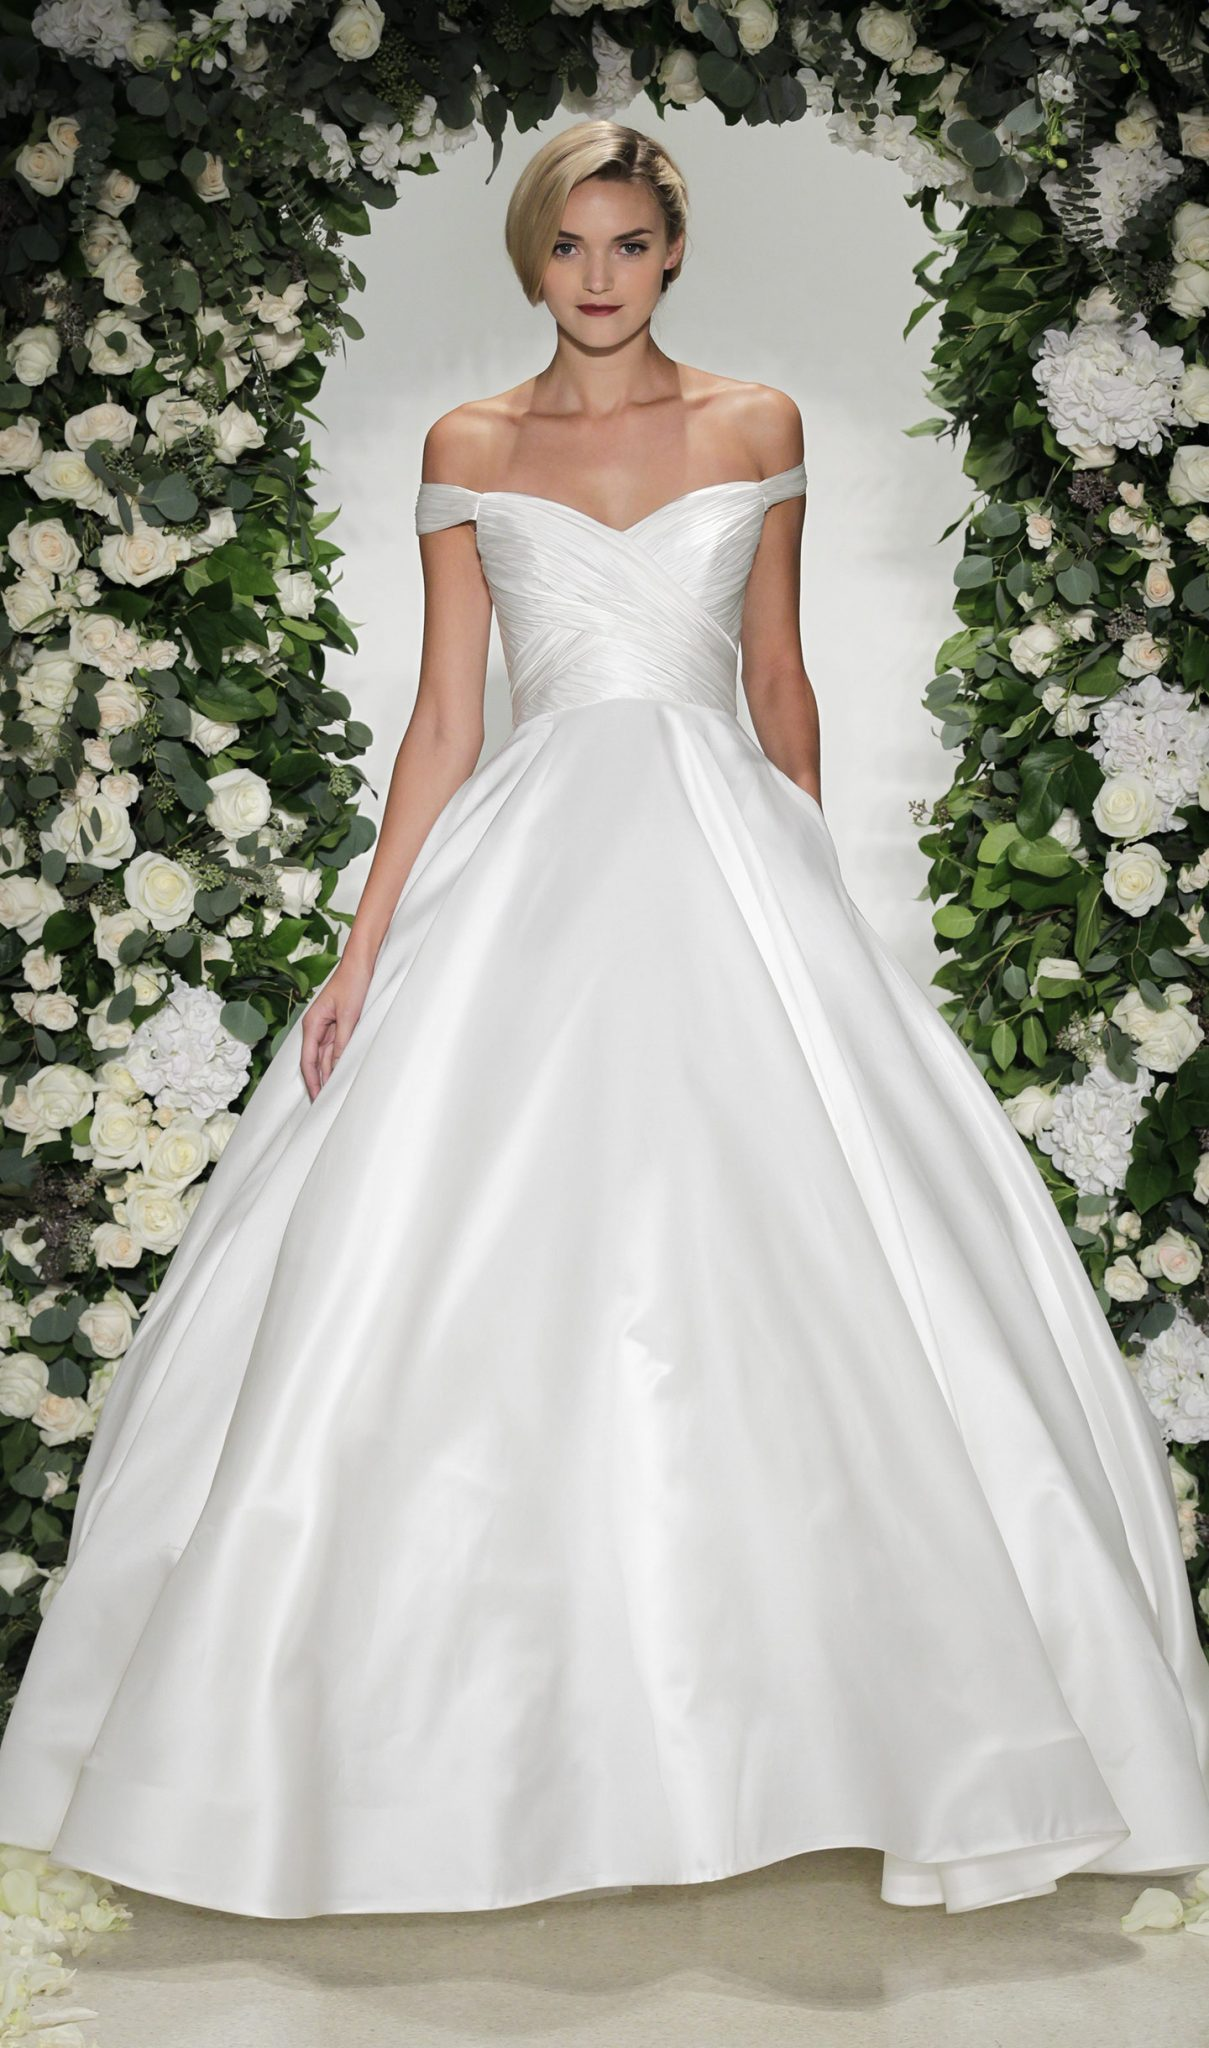 wardrobe breakdown scandals olivia popes wedding gown